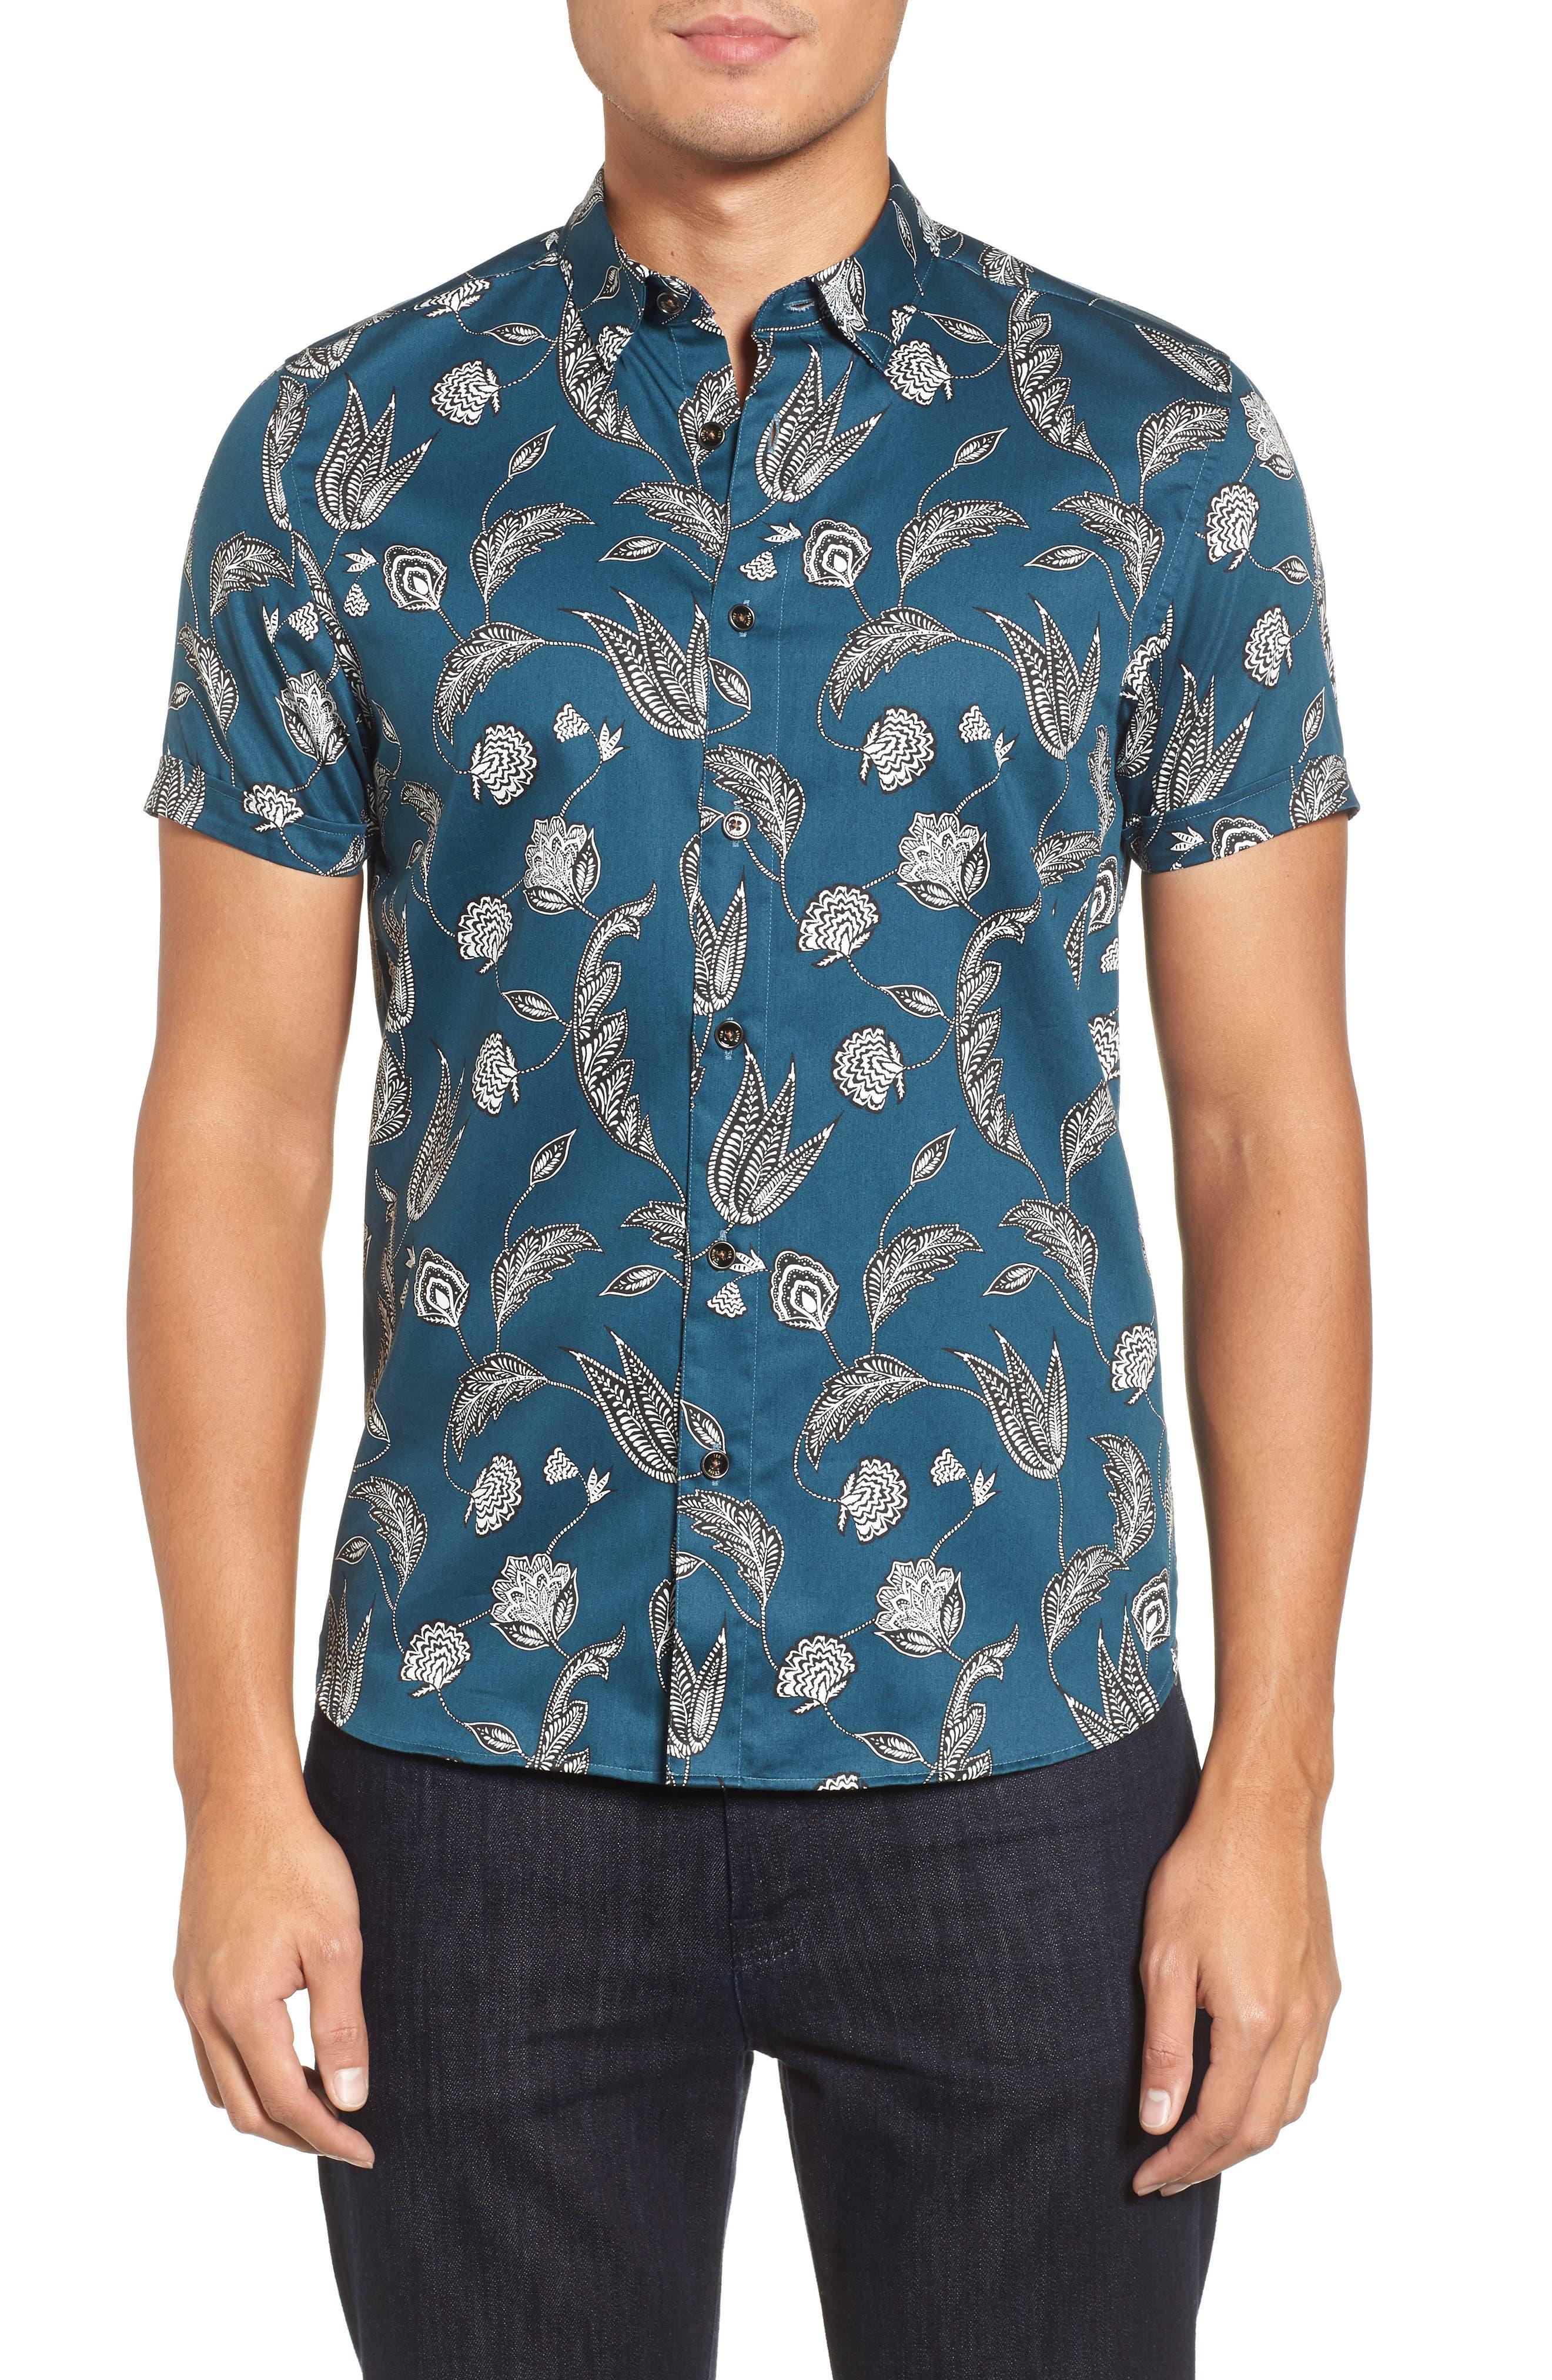 UTKU Floral Sport Shirt,                         Main,                         color,